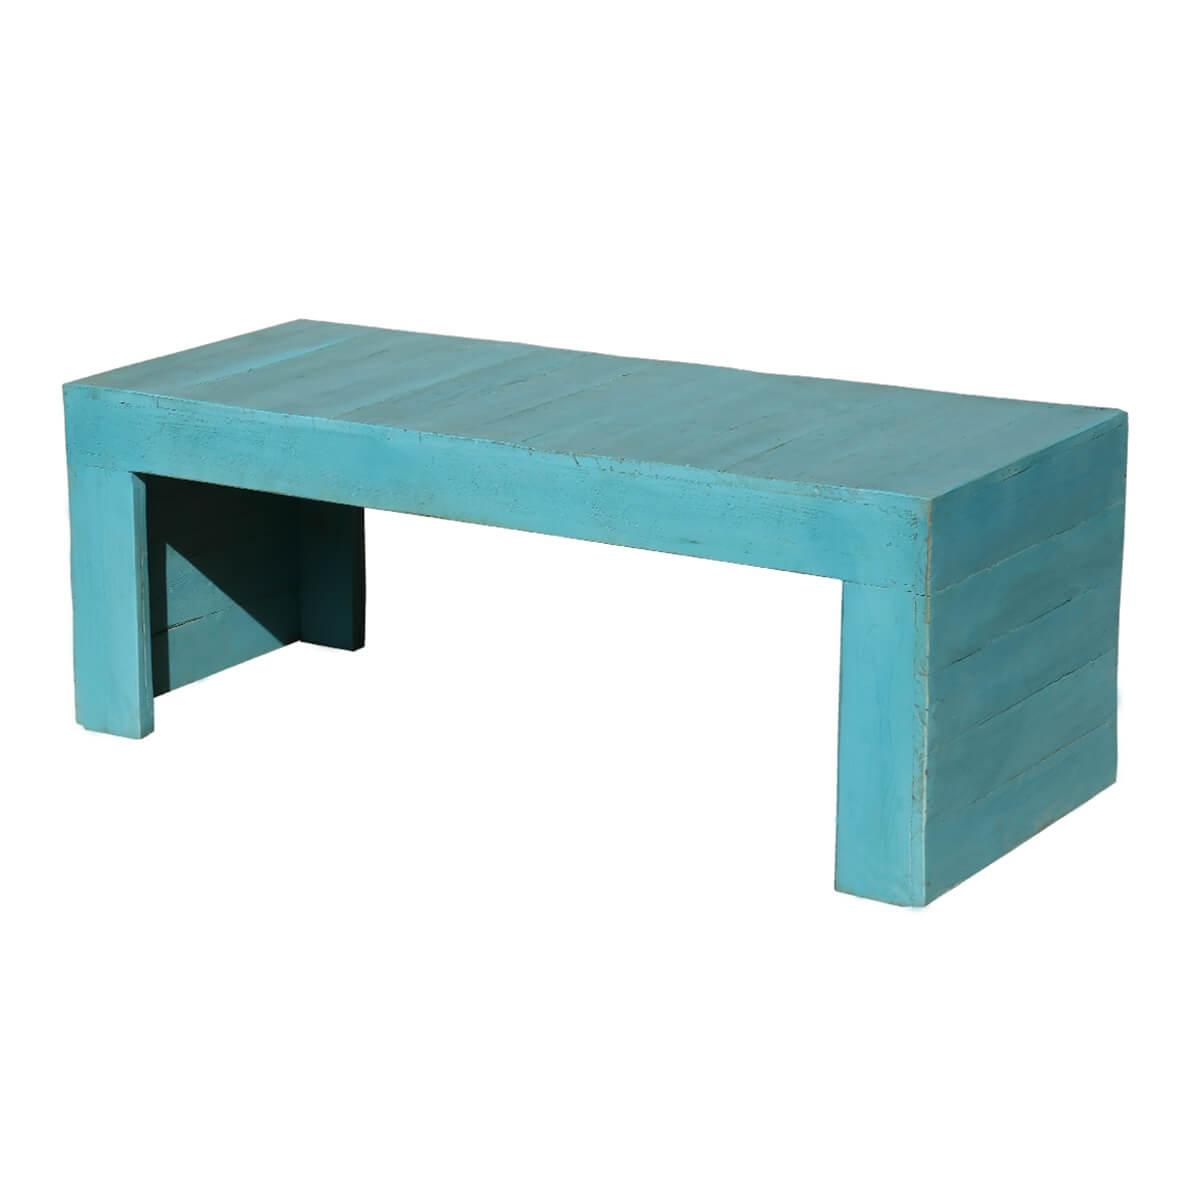 Sky Blue Handmade Patio Coffee Table Bench